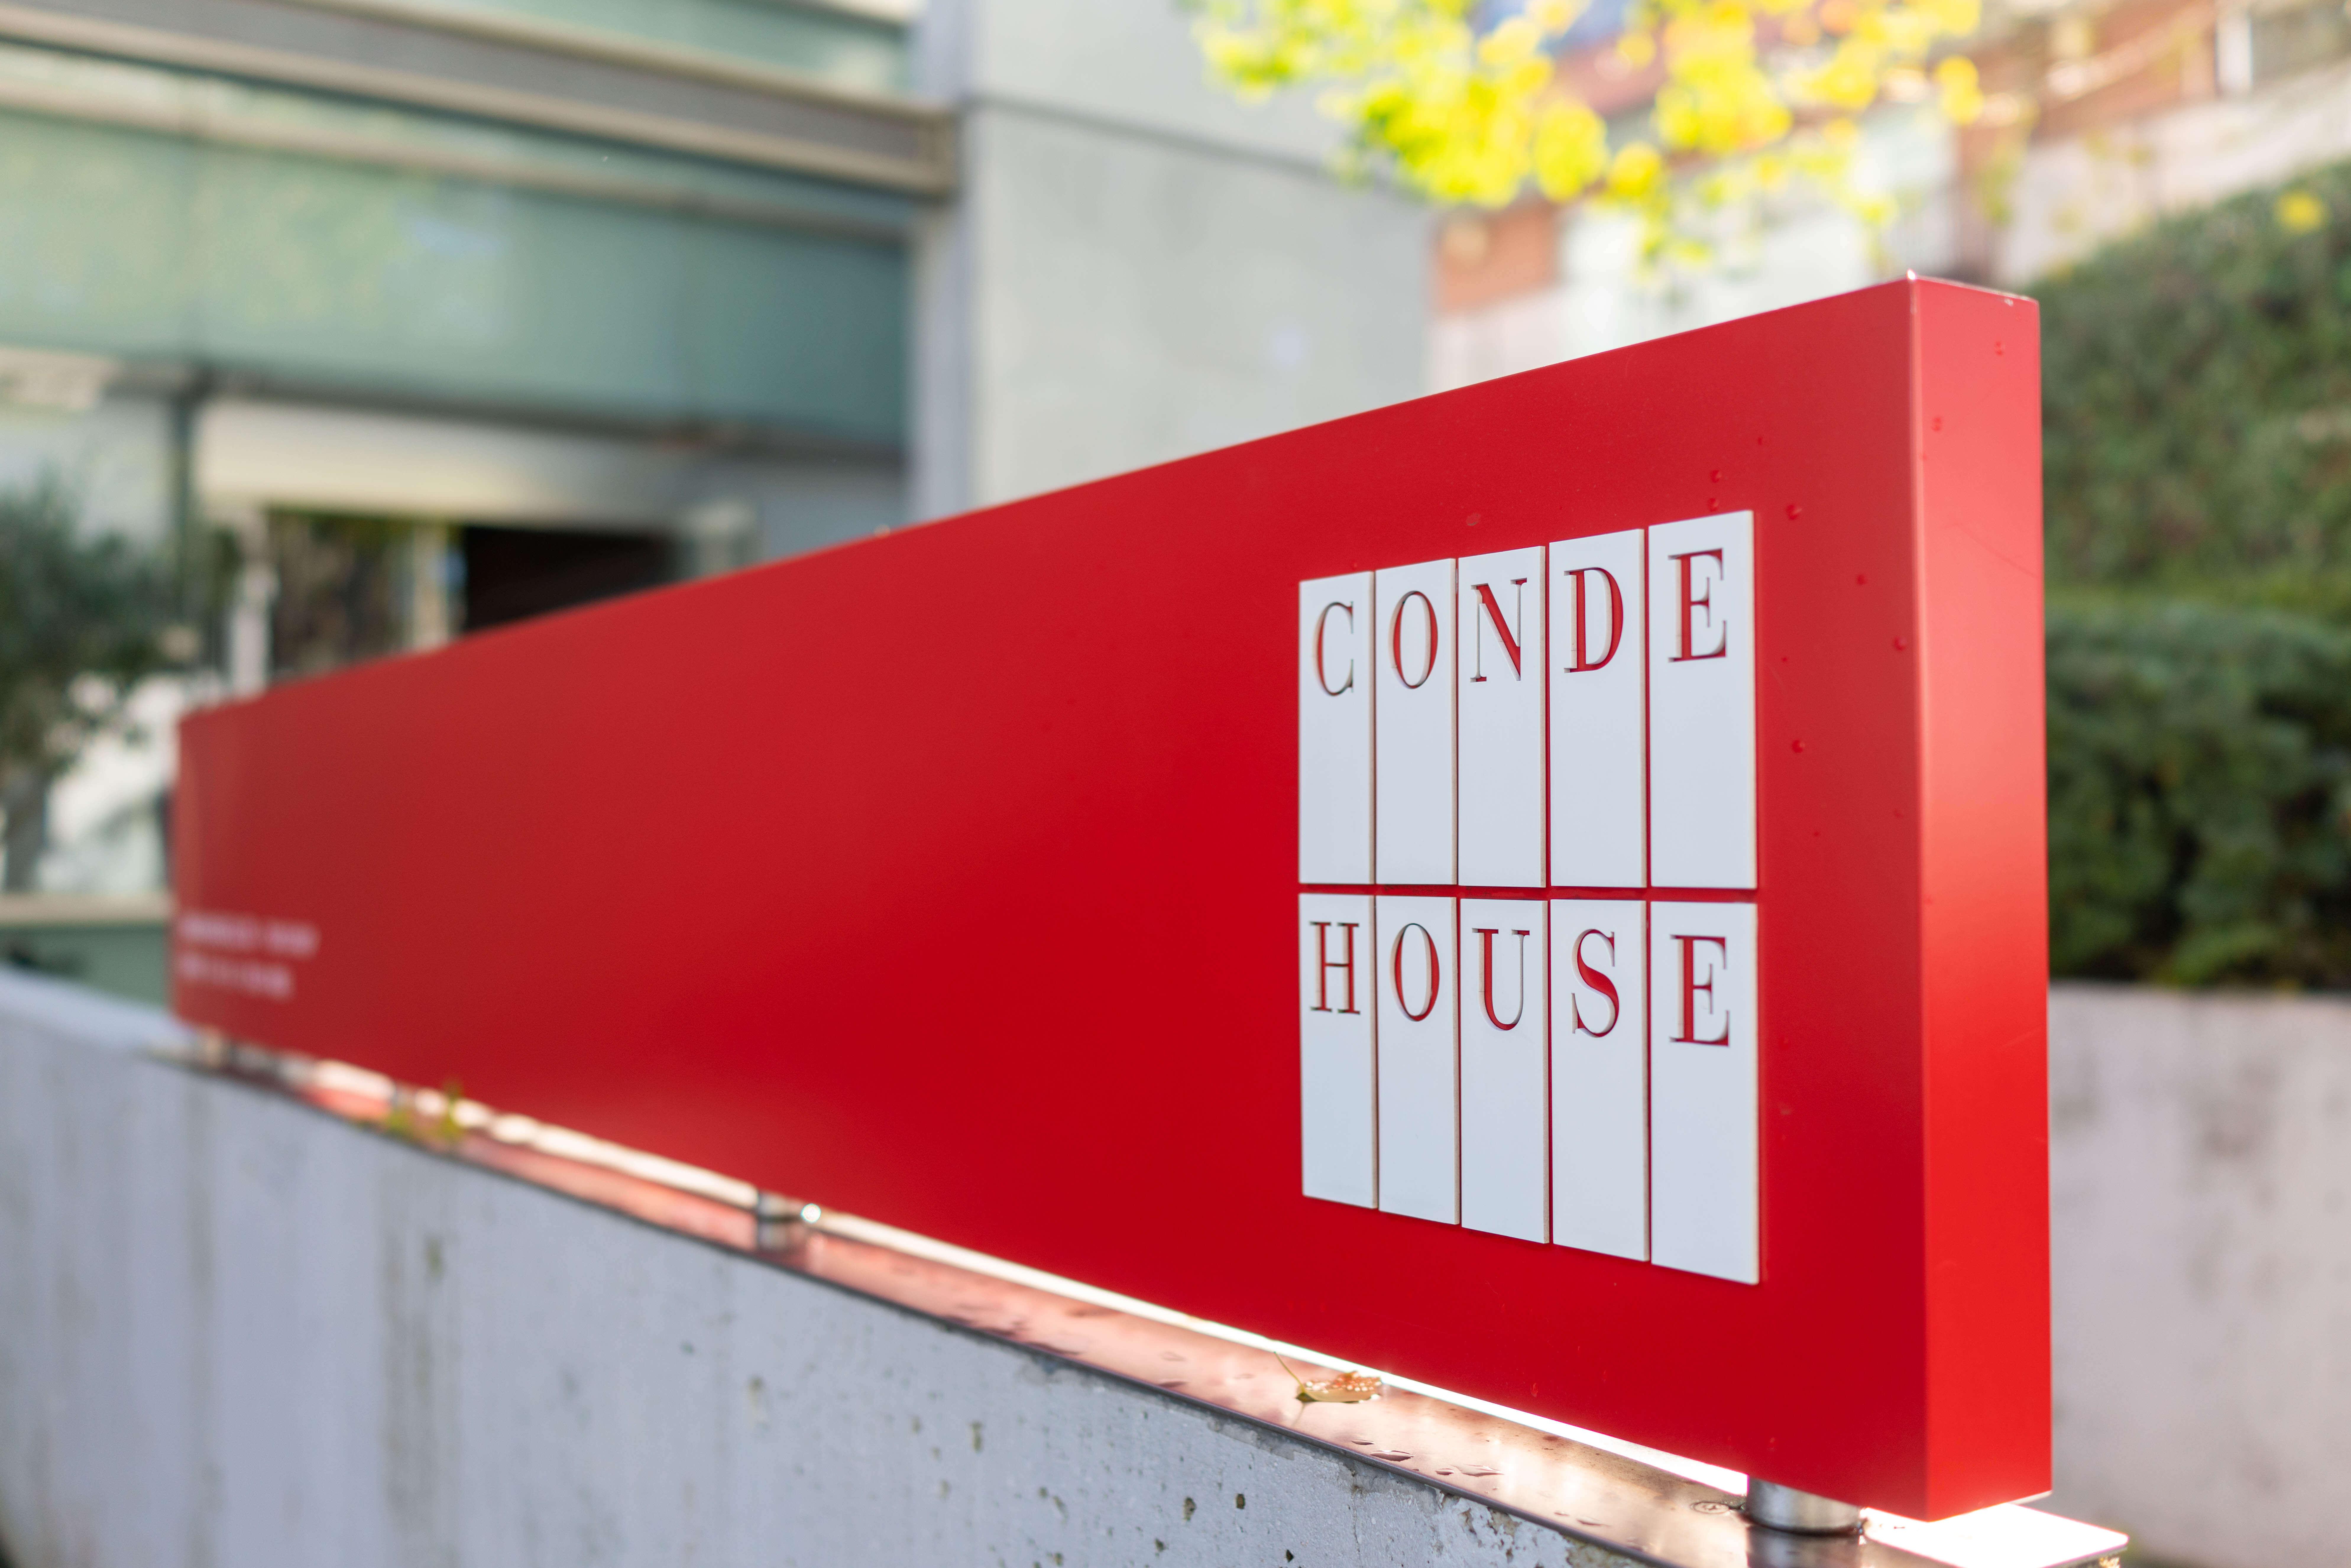 CONDE HOUSEの看板